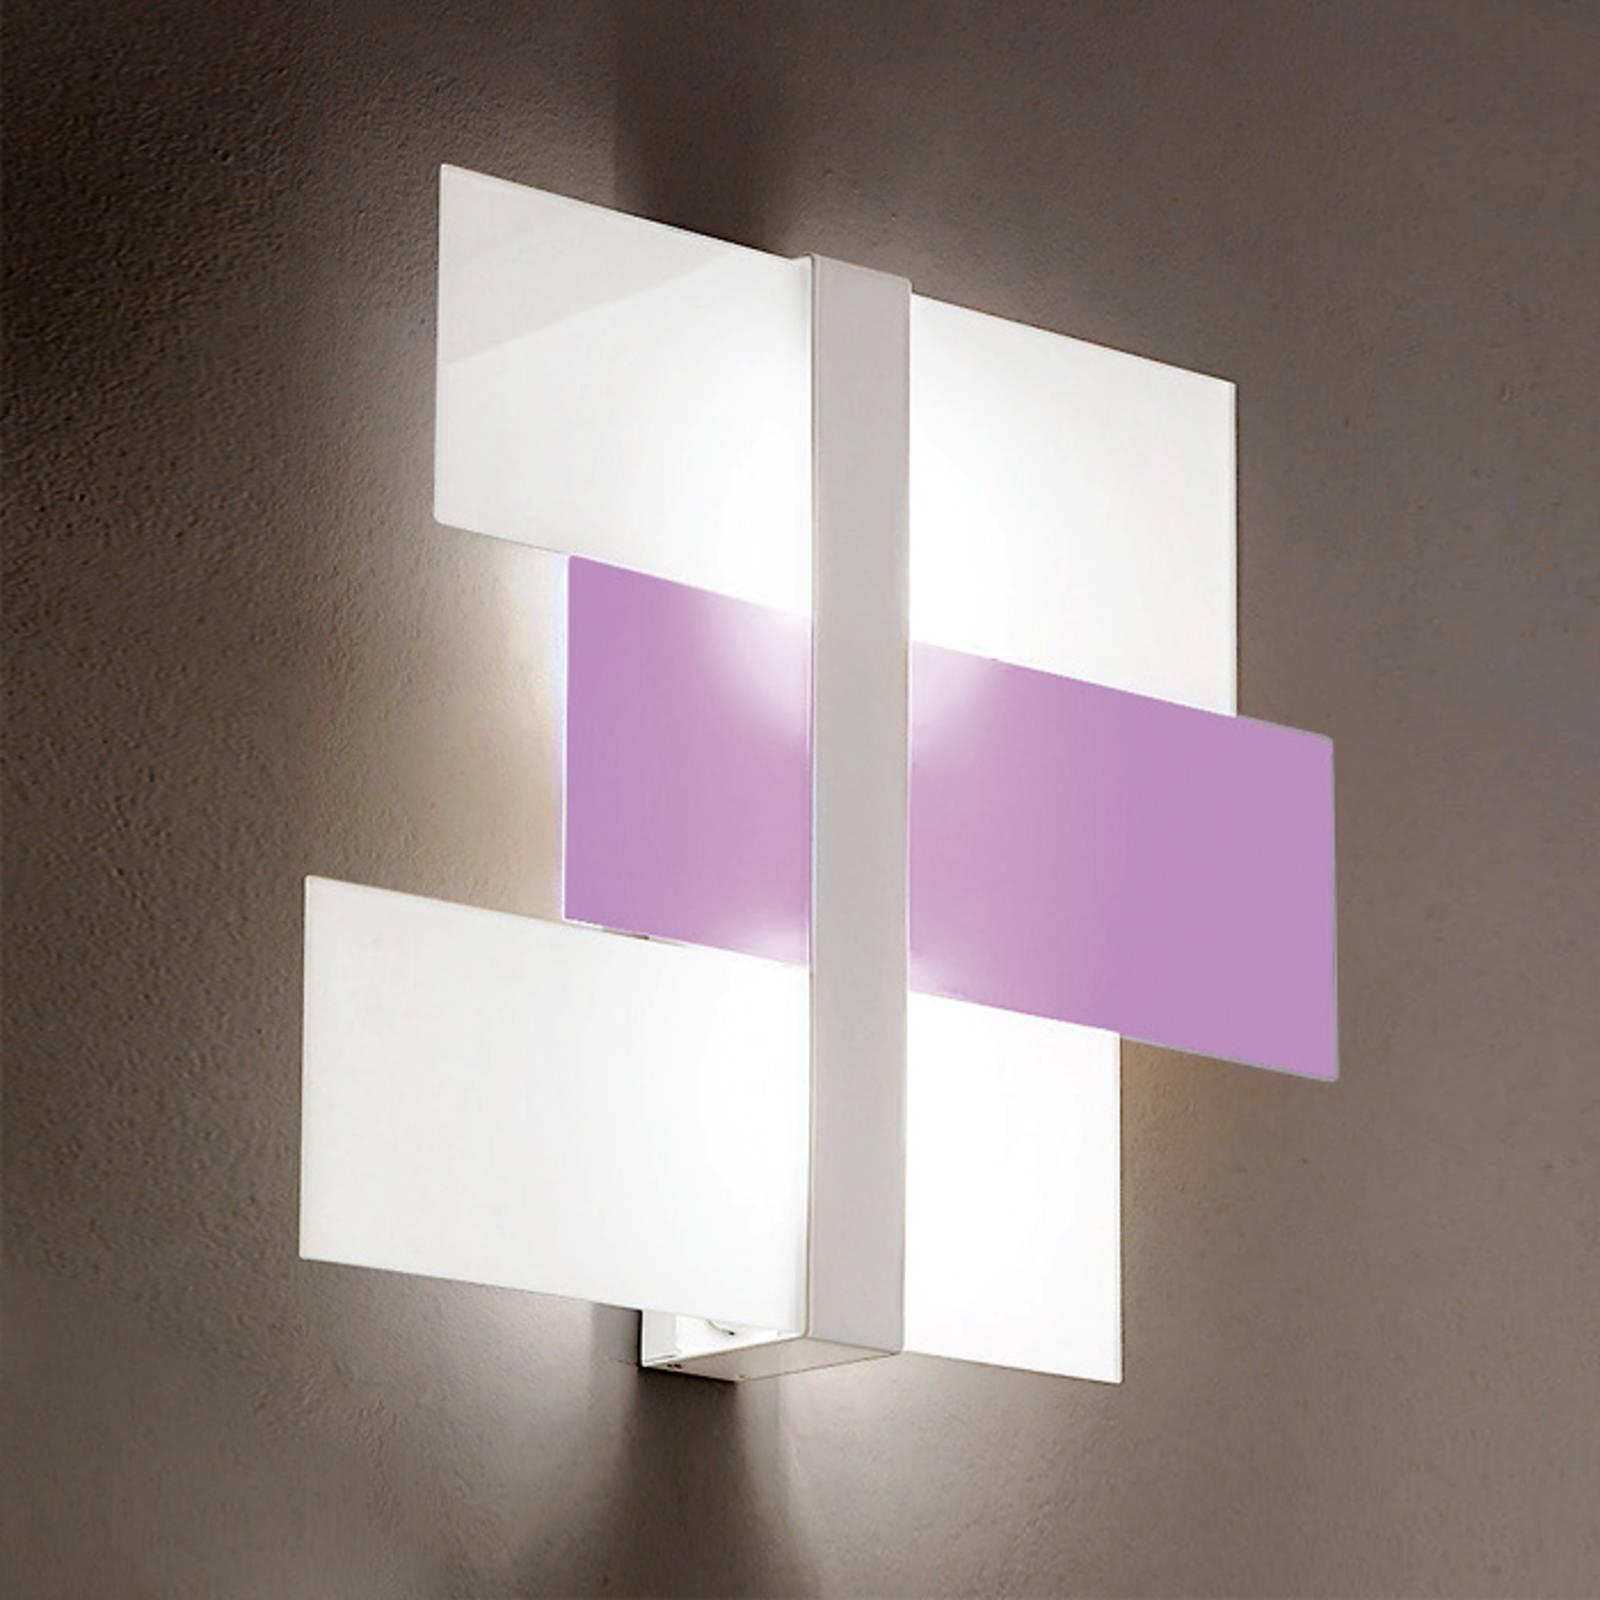 Applique Triad 62cm blanche/violette